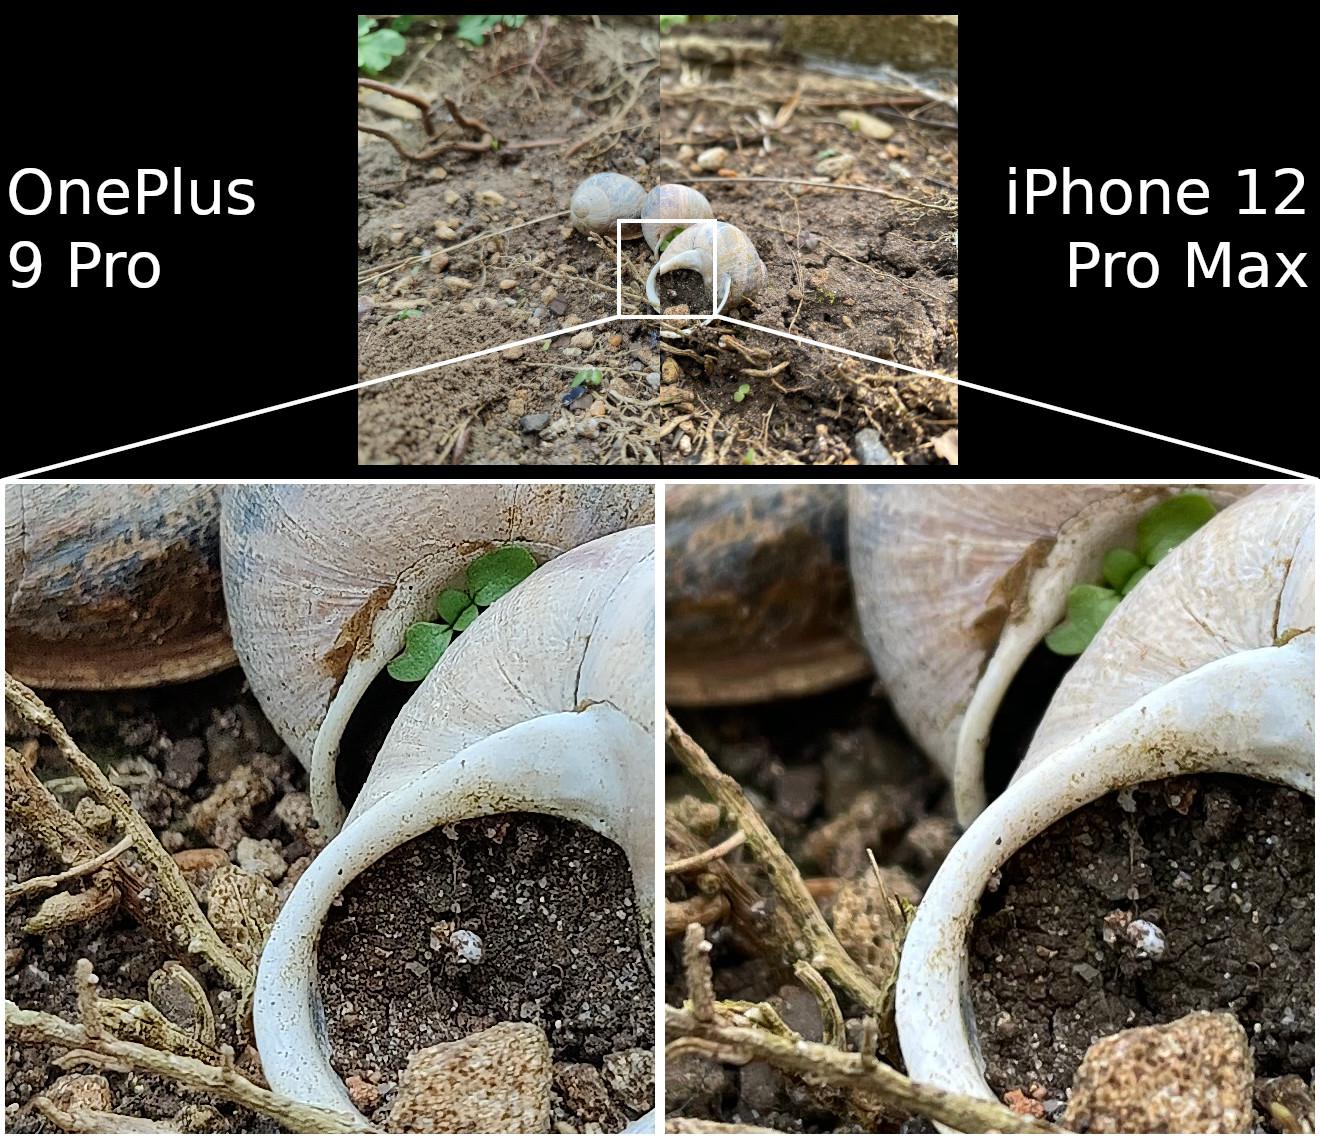 OnePlus 9 Pro vs iPhone 12 Pro Max detail